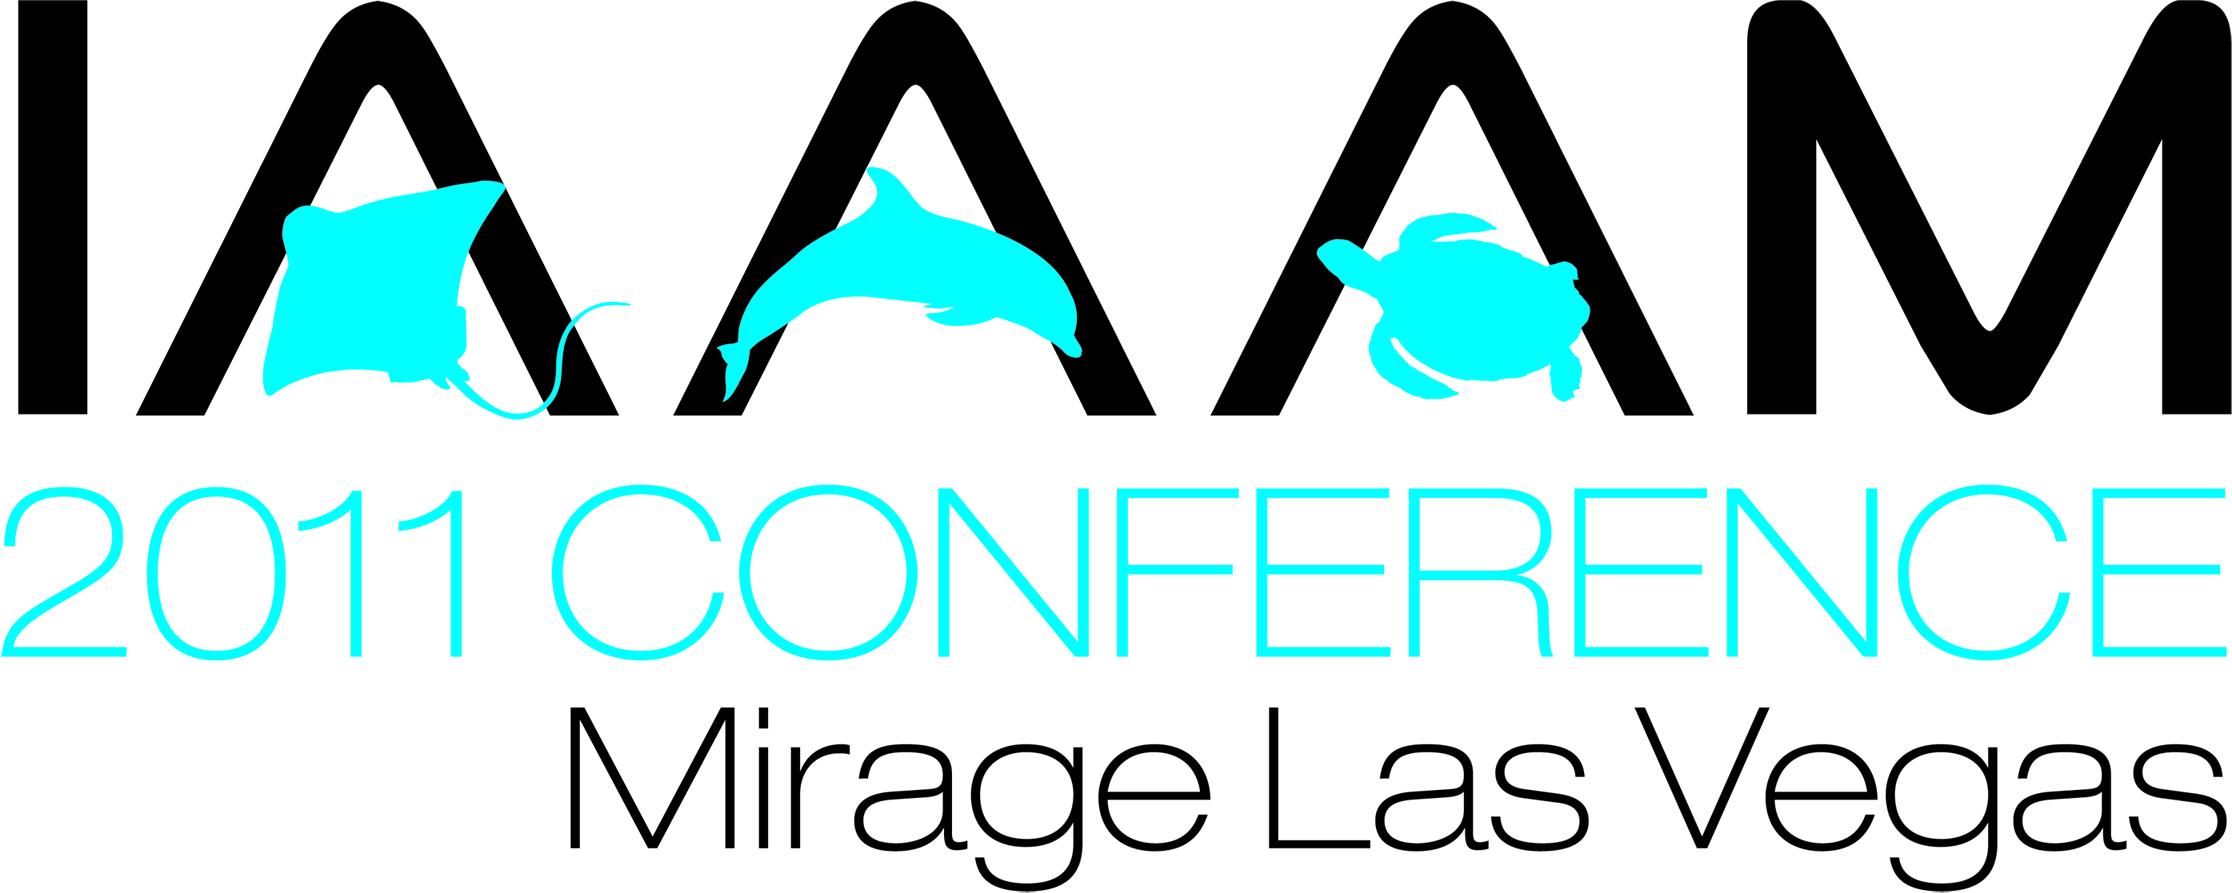 iaaam_conf_logo_2011.jpg